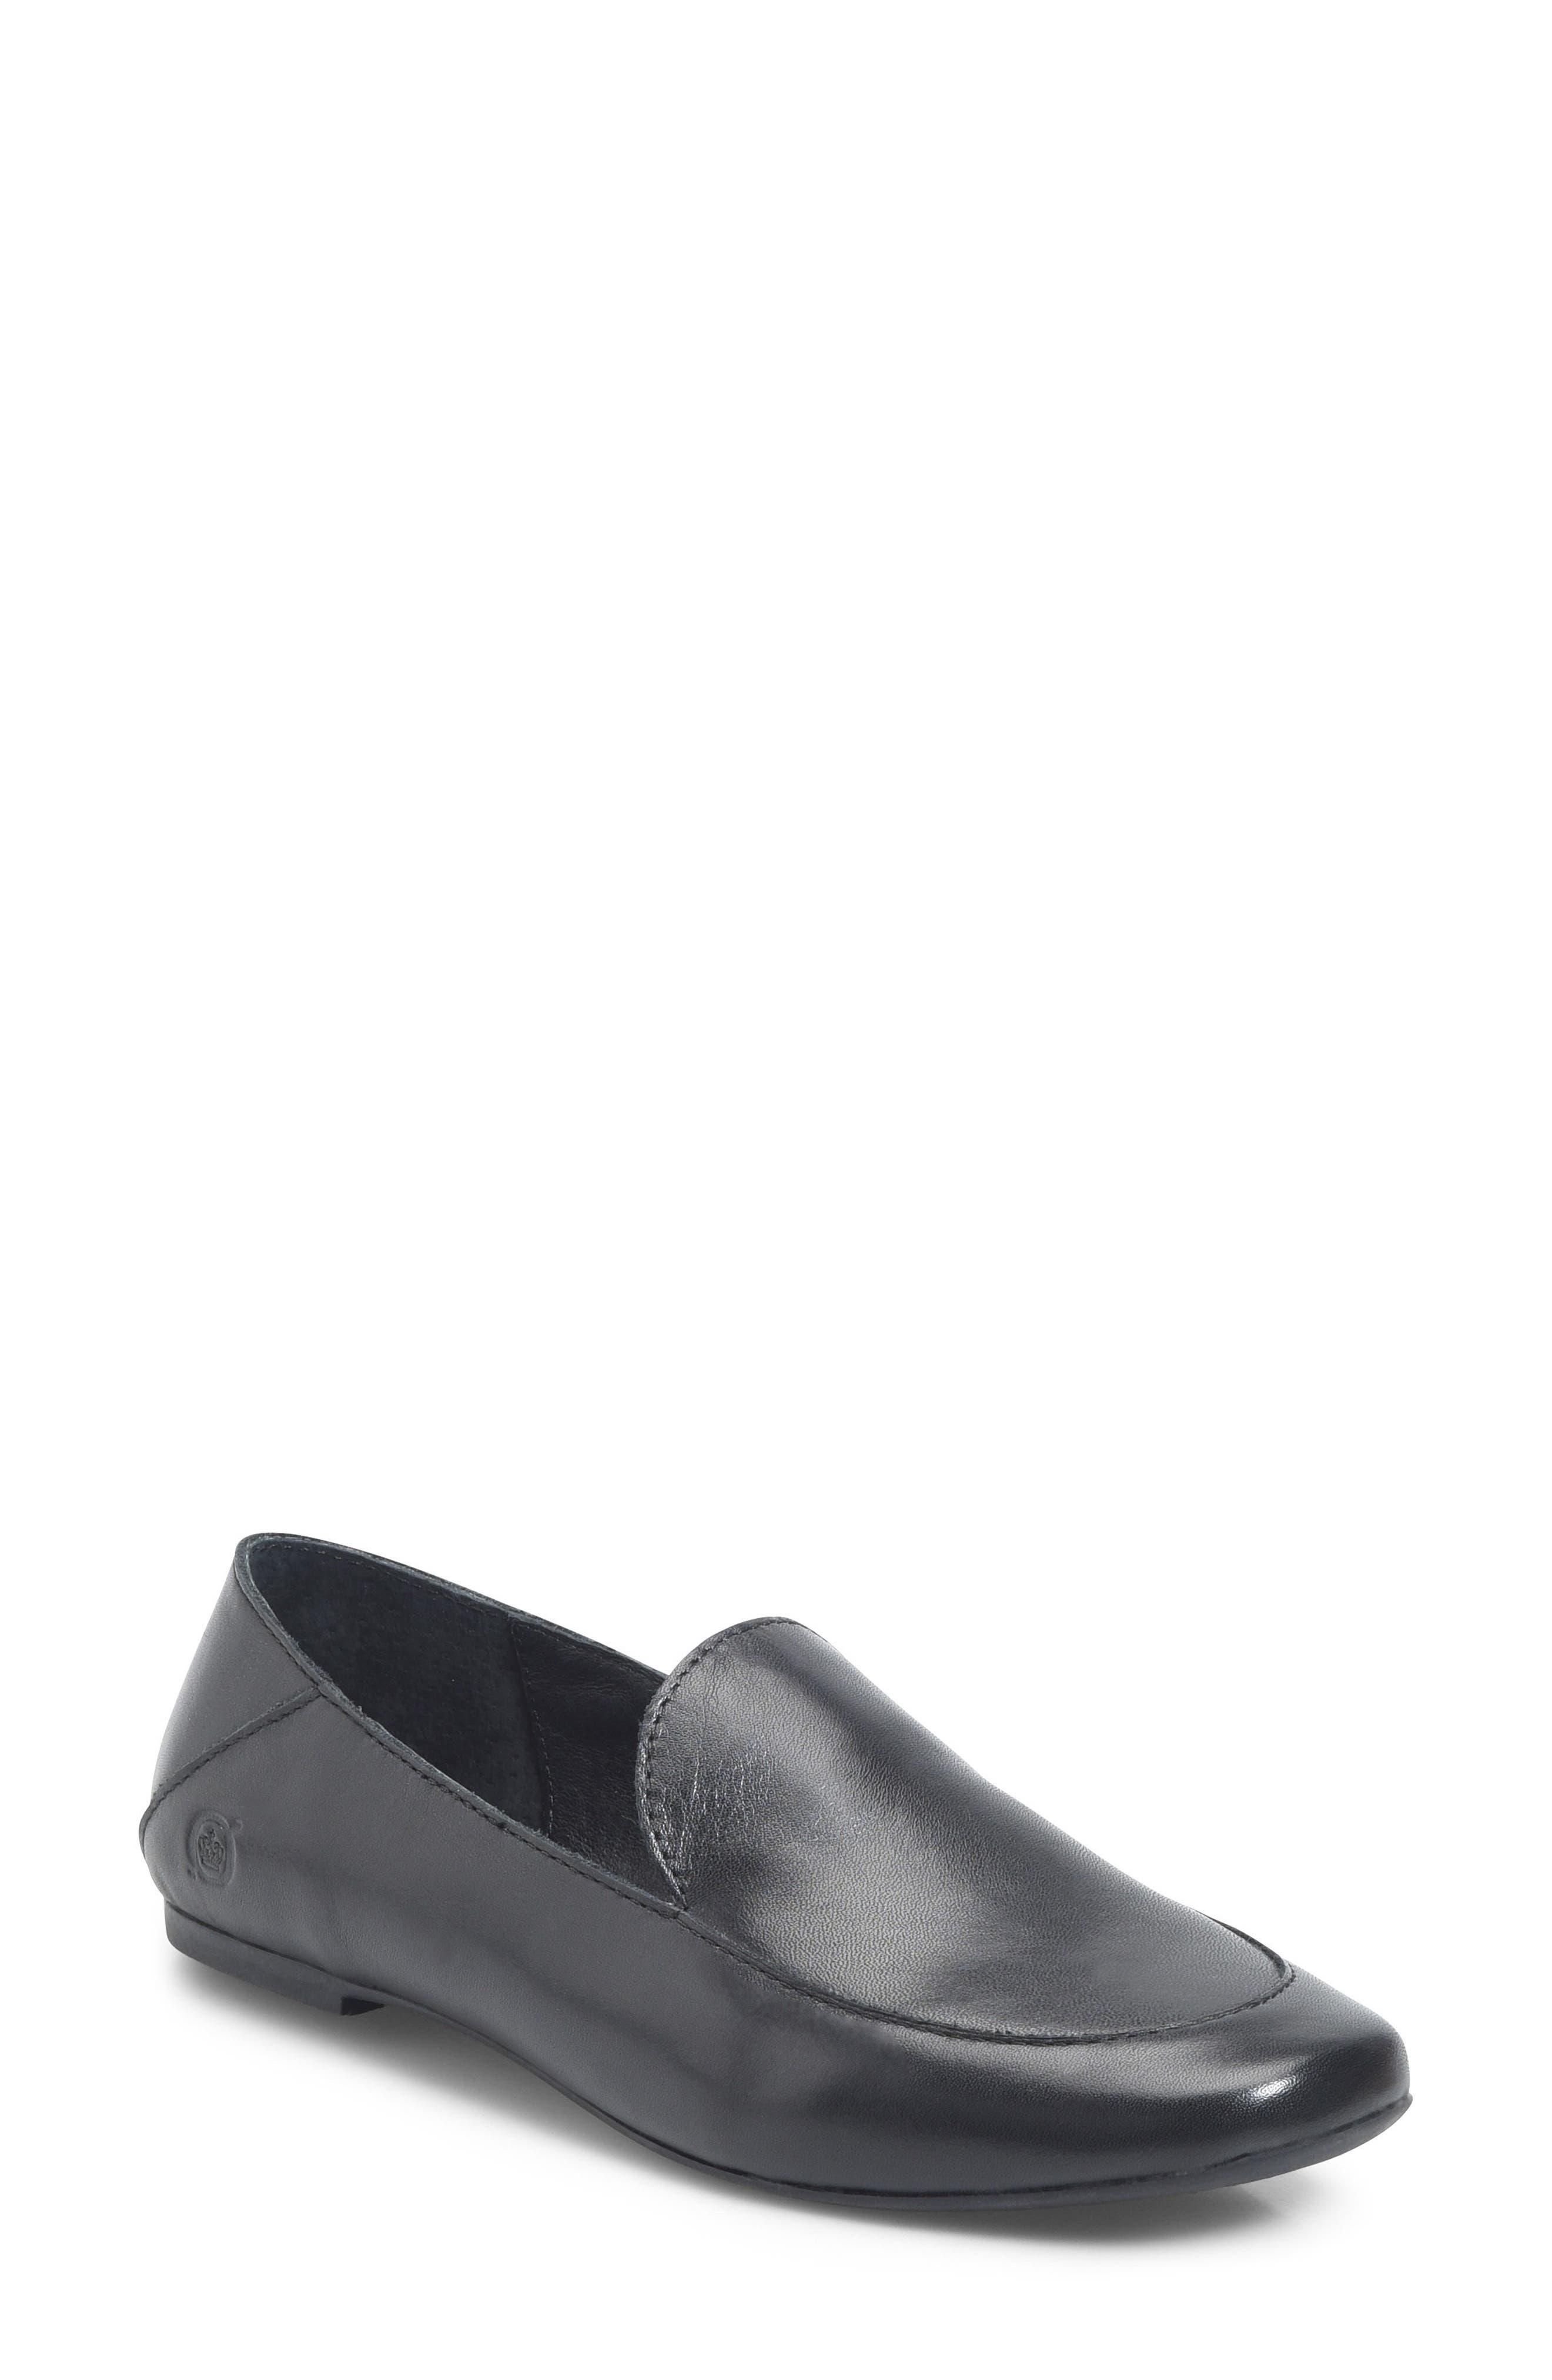 Carib Loafer,                         Main,                         color, Black Leather